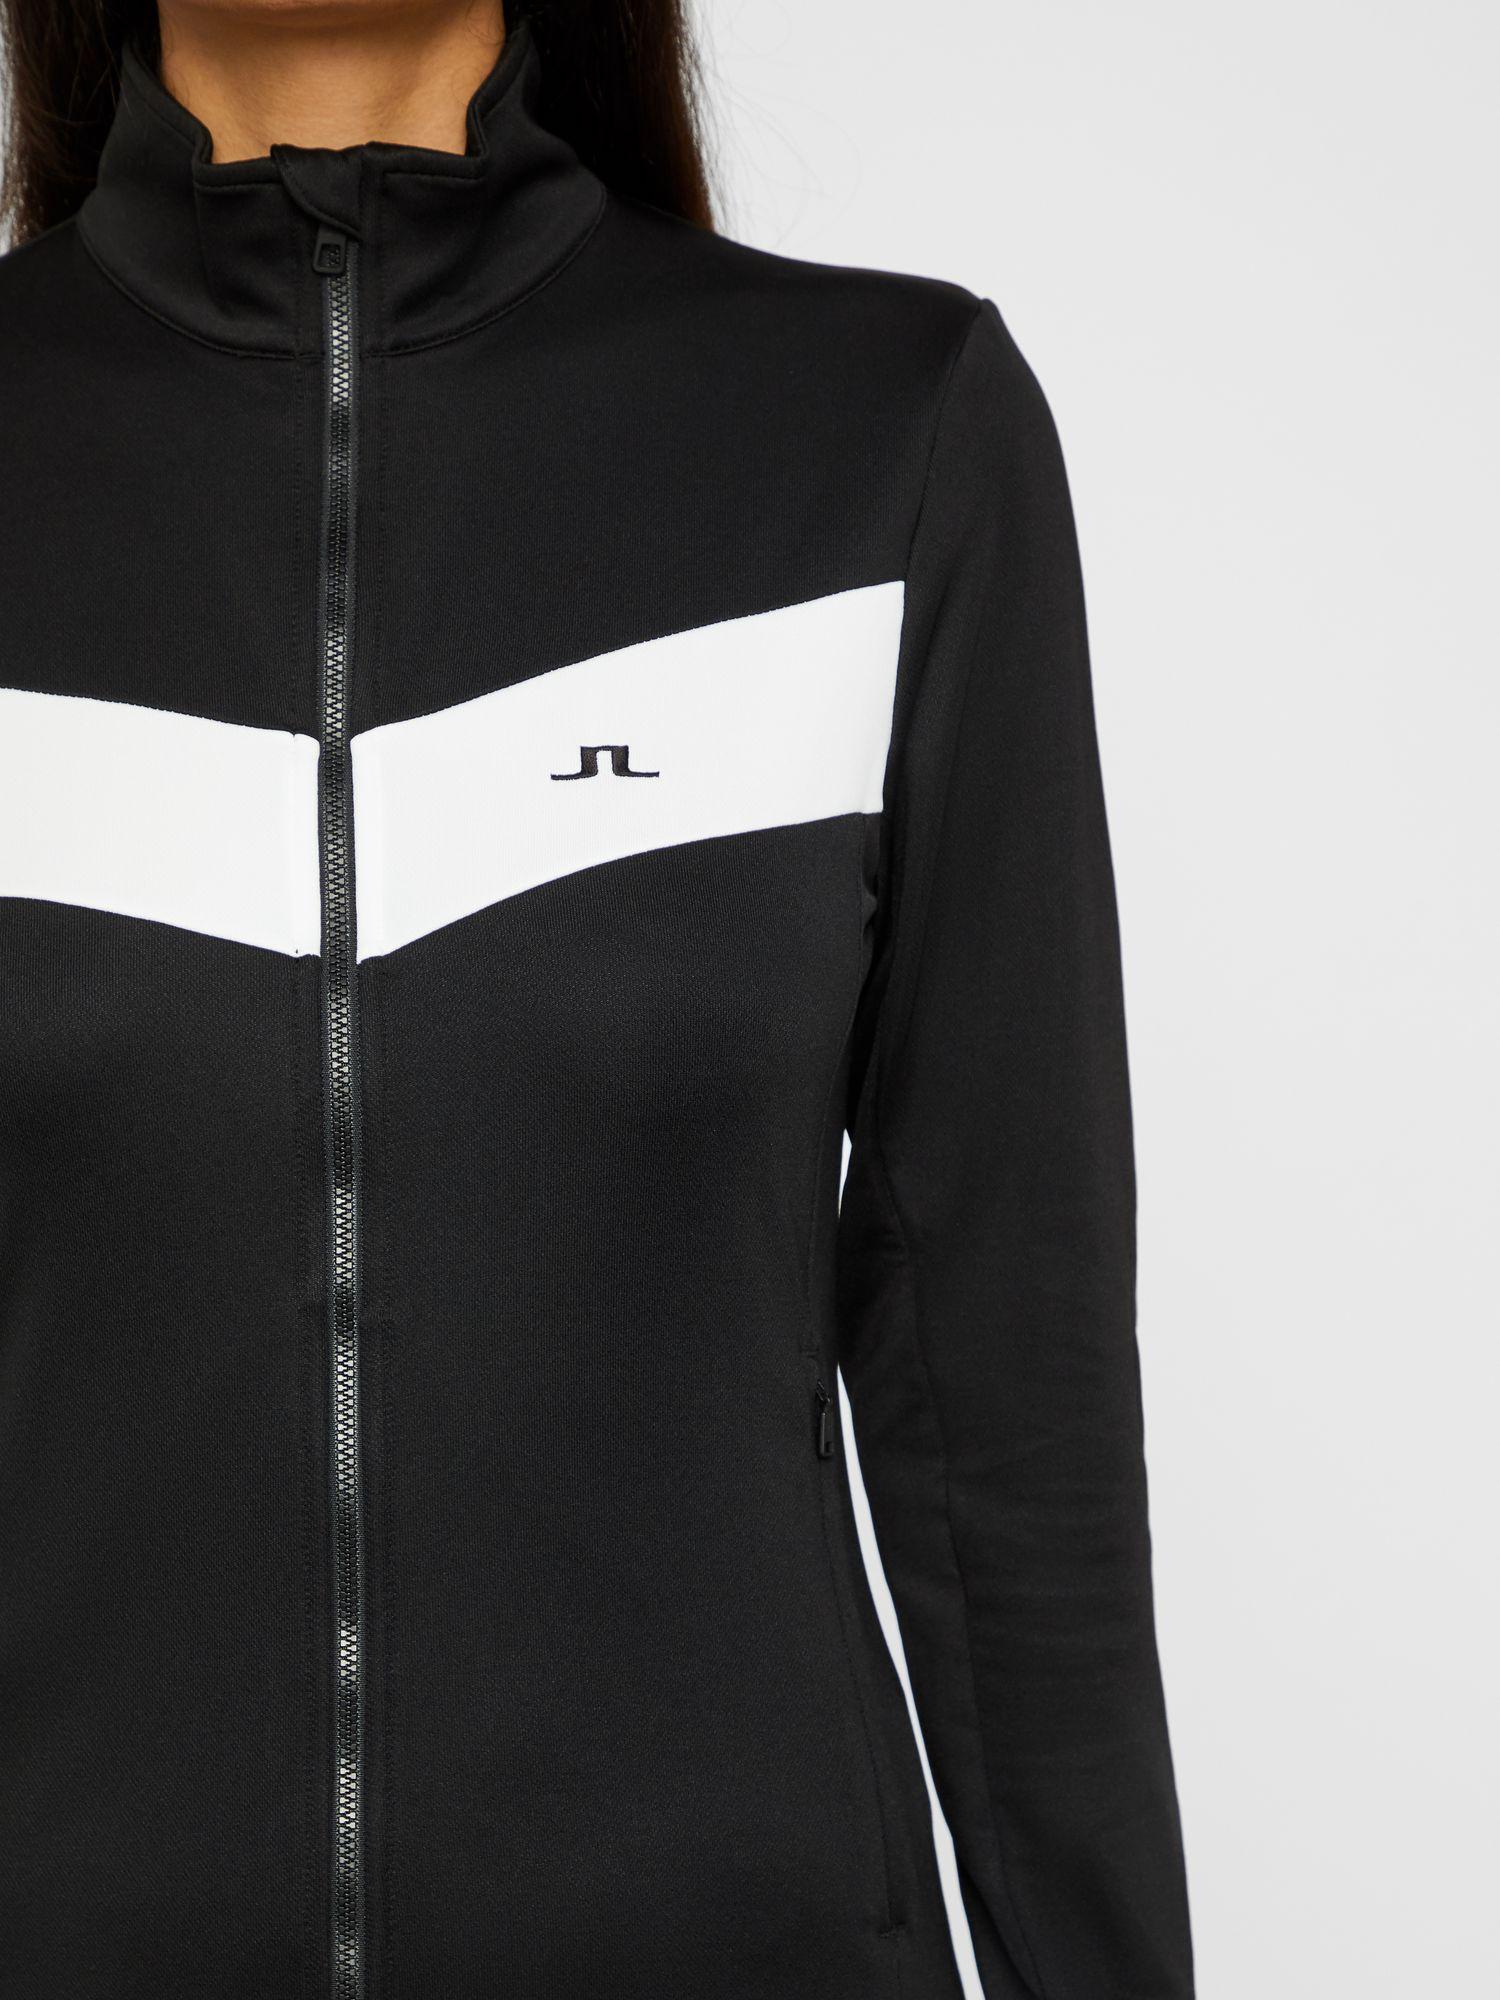 Women's Russel TX Midlayer Jacket Sale